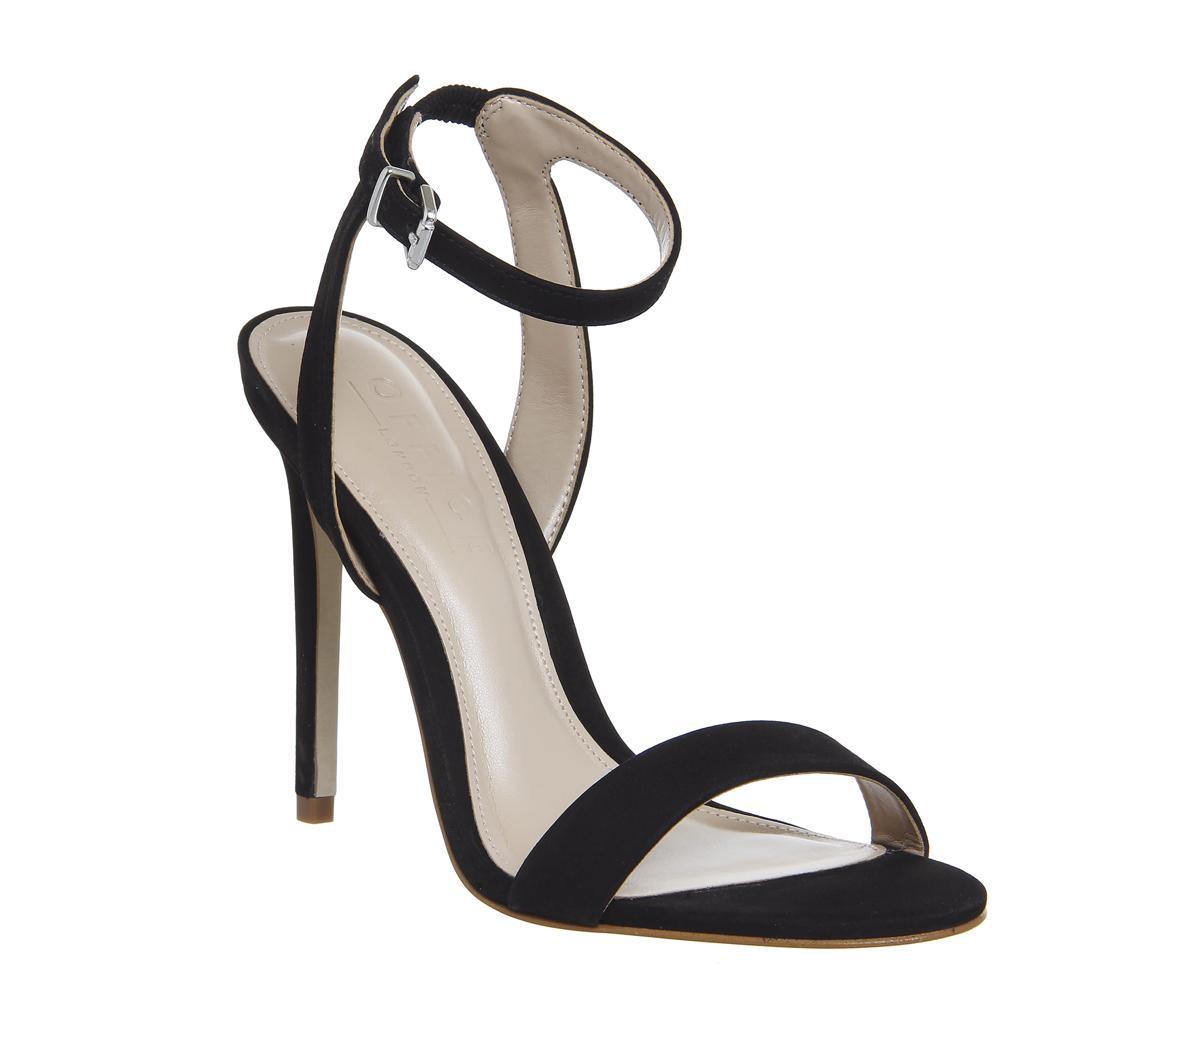 Alana Single Sole Sandals